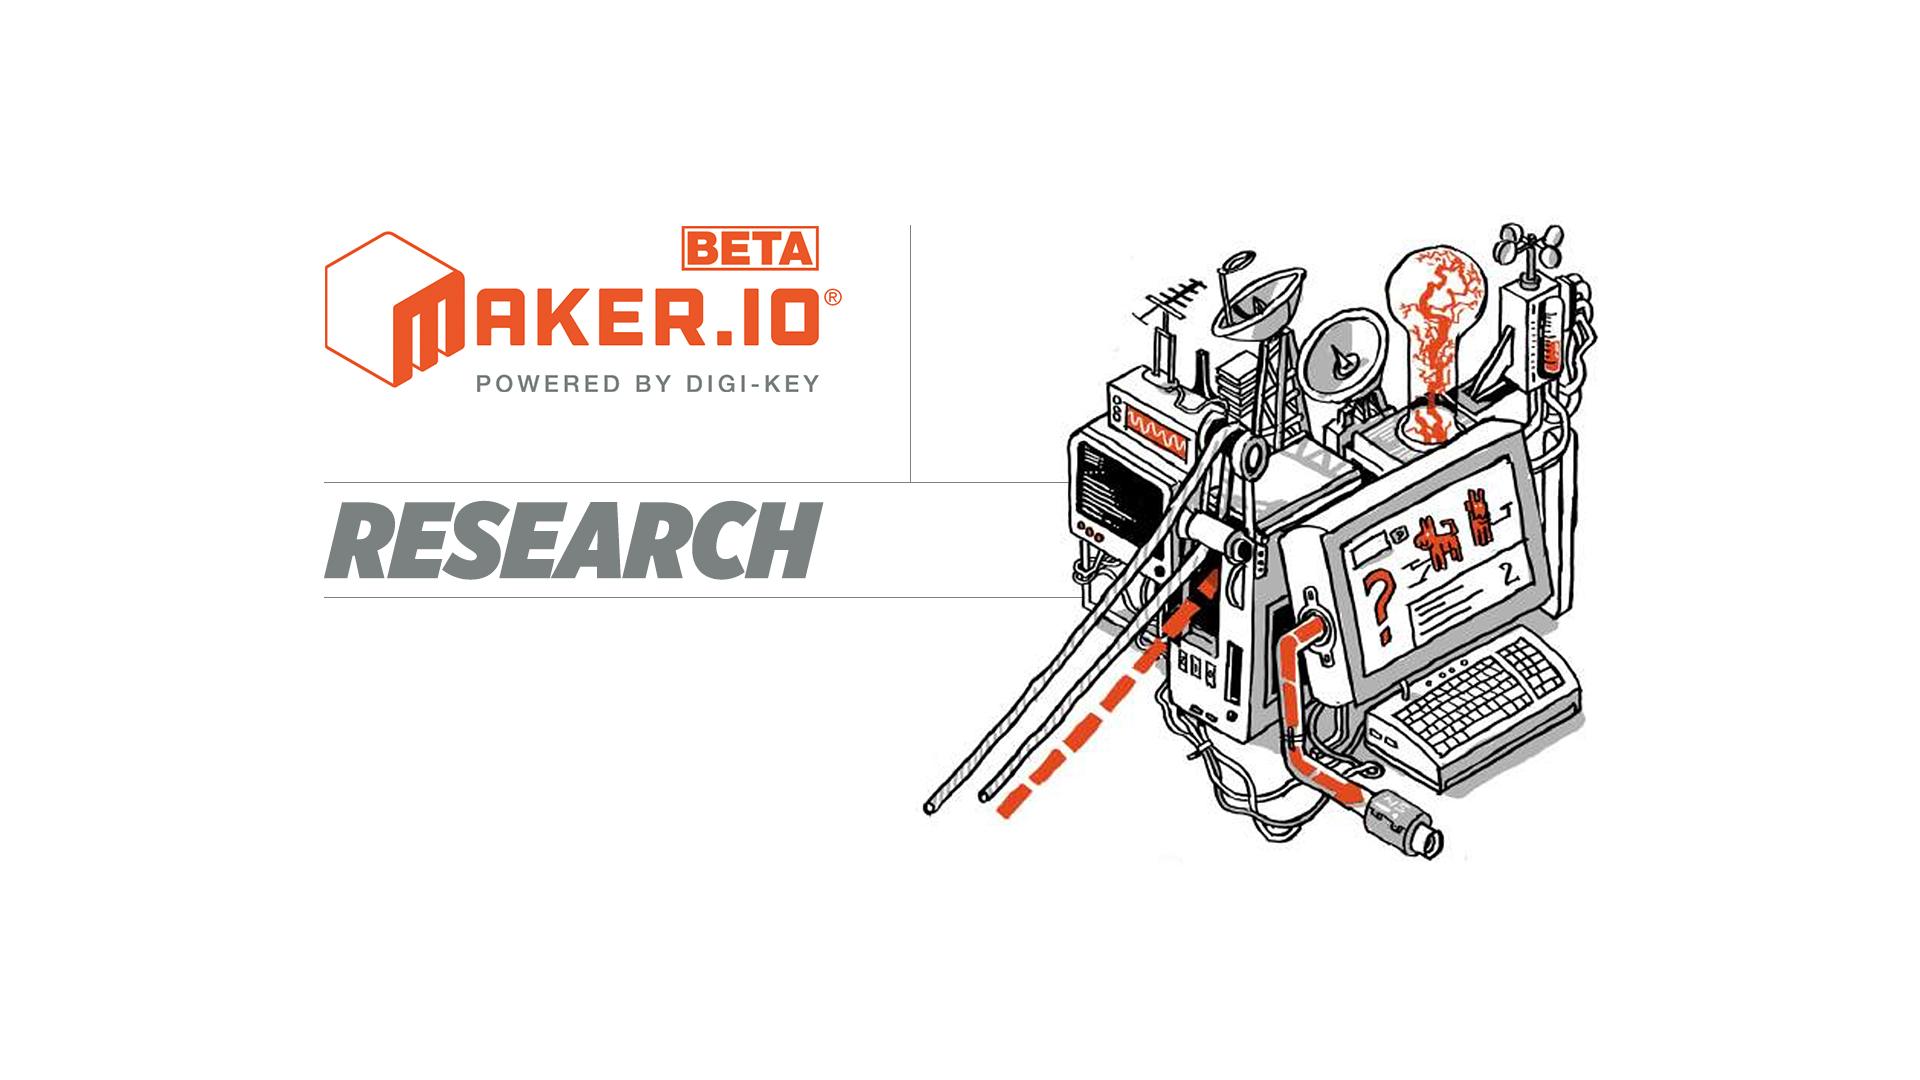 adafruit_maker_io_digikey_video_research